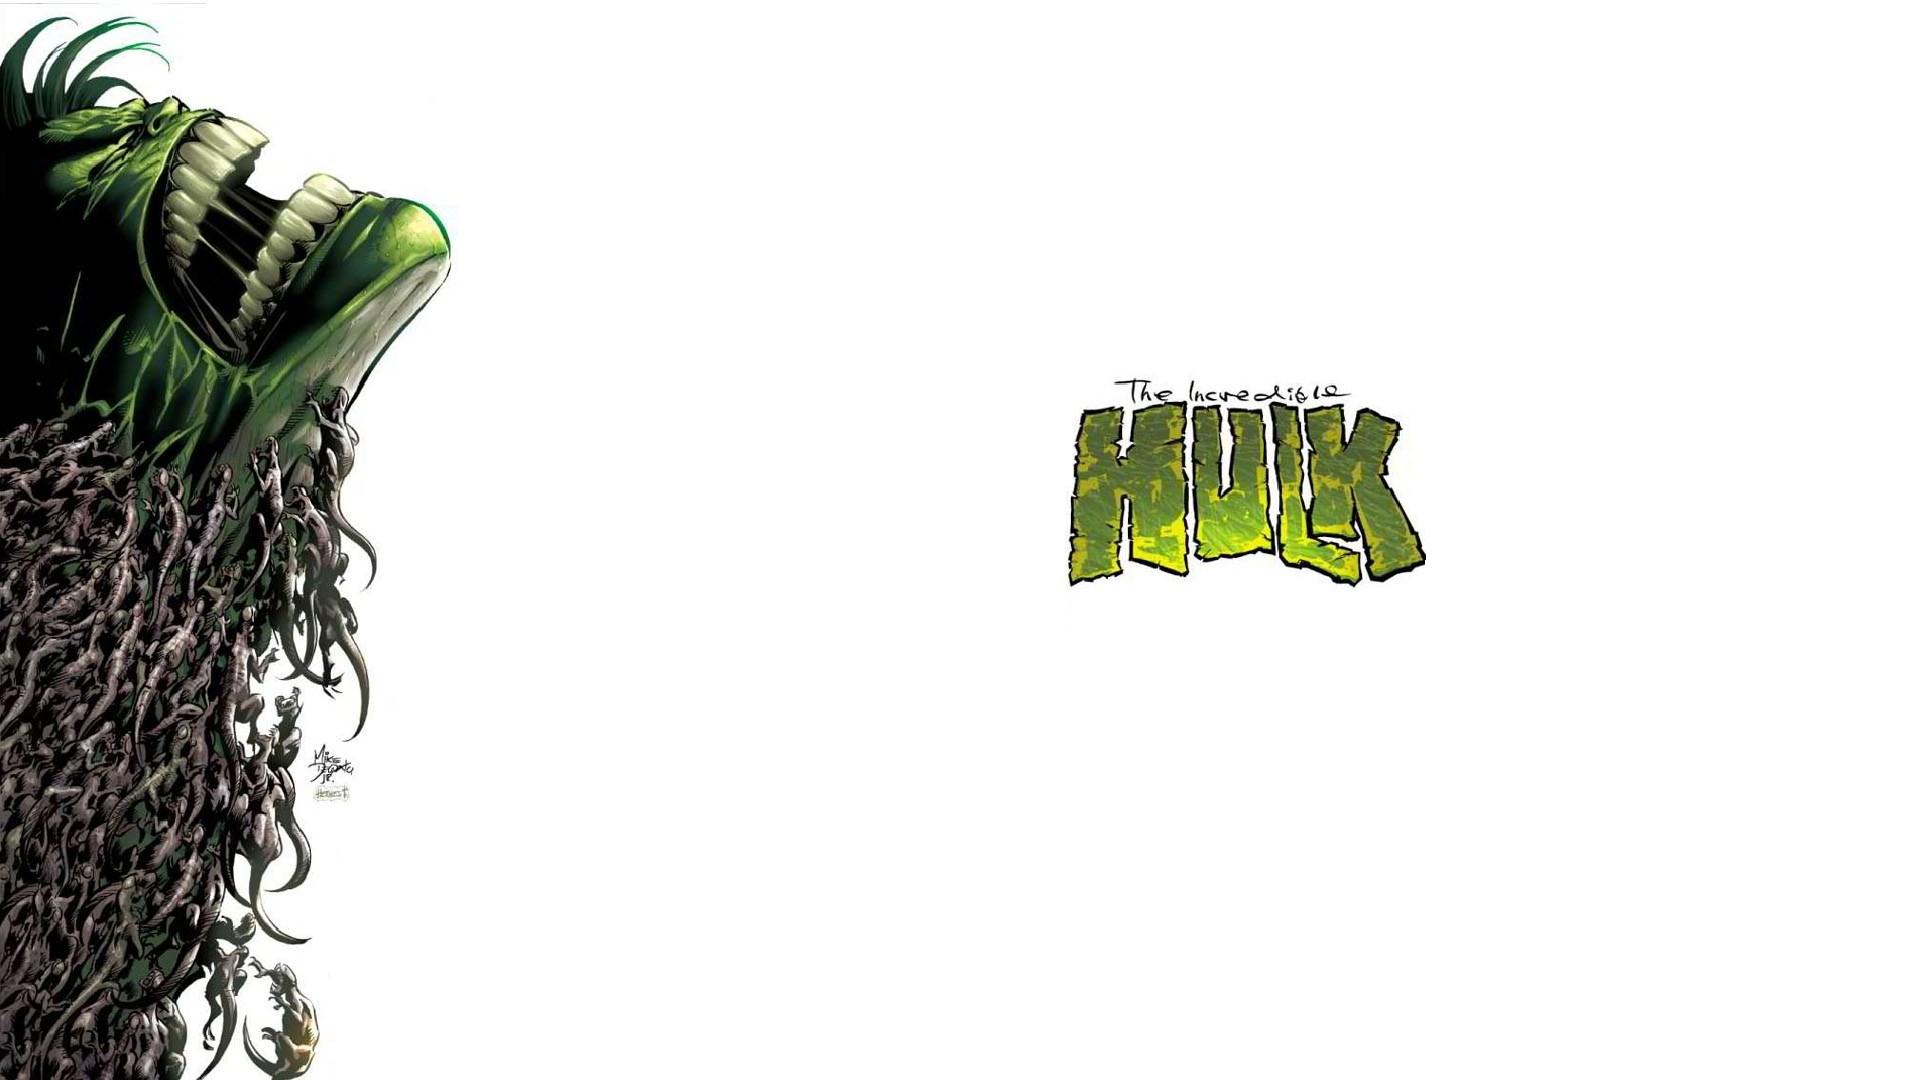 1920x1080-hd-the-incredible-hulk-wallpaper-wpc9201033